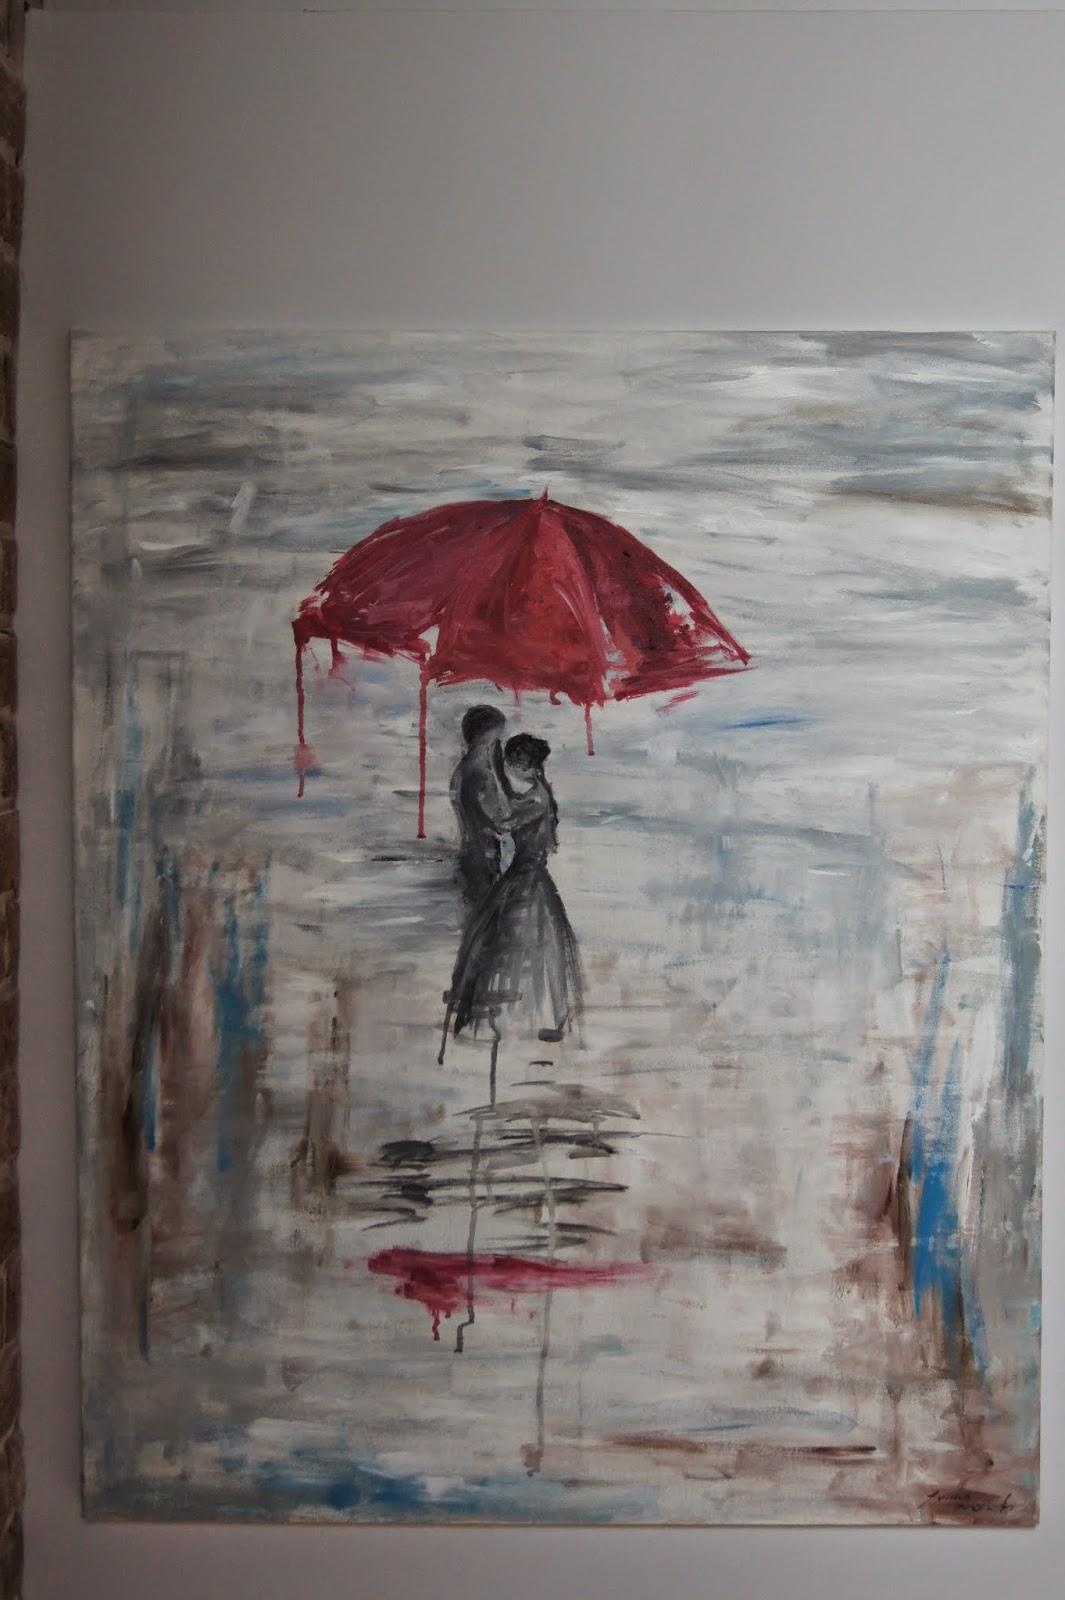 Johanna Obraz Farbami Akrylowymi